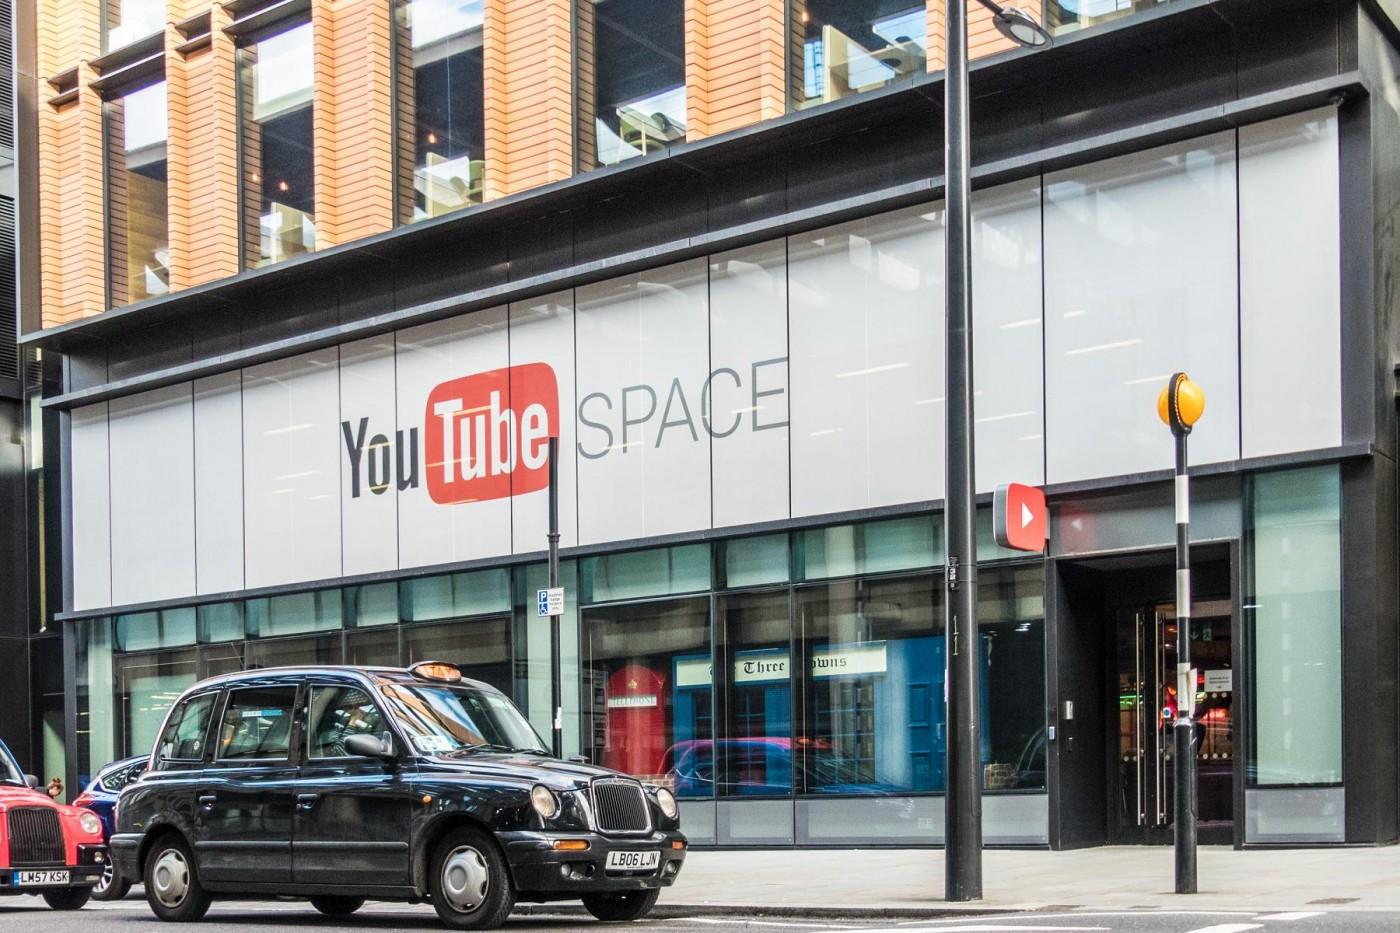 YouTube Music來了,我該跳槽嗎?一文搞懂YouTube系3大訂閱制有何不同